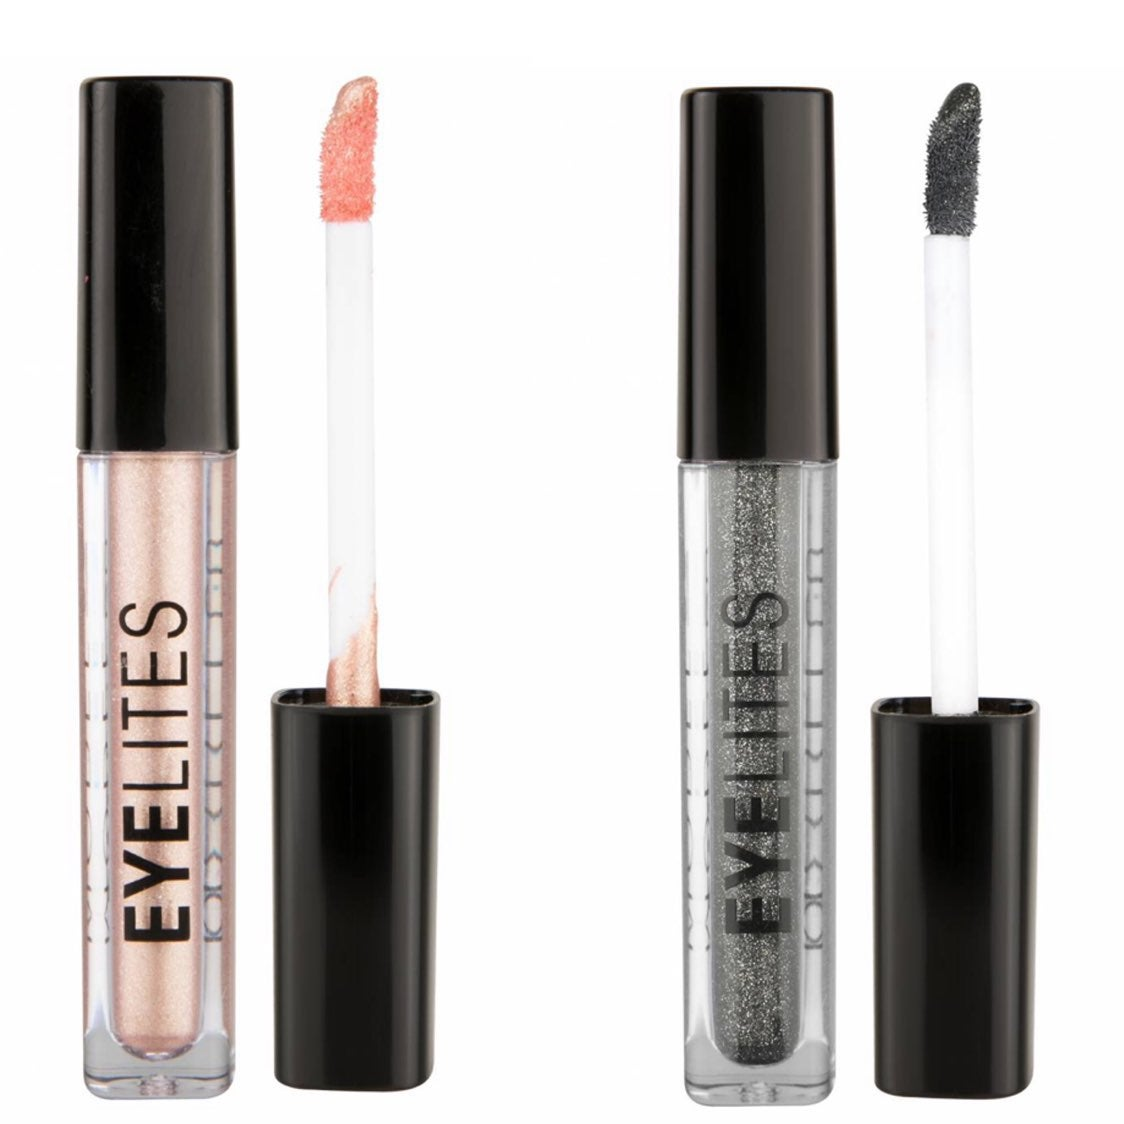 Model Co Eyelites Cream Eyeshadows